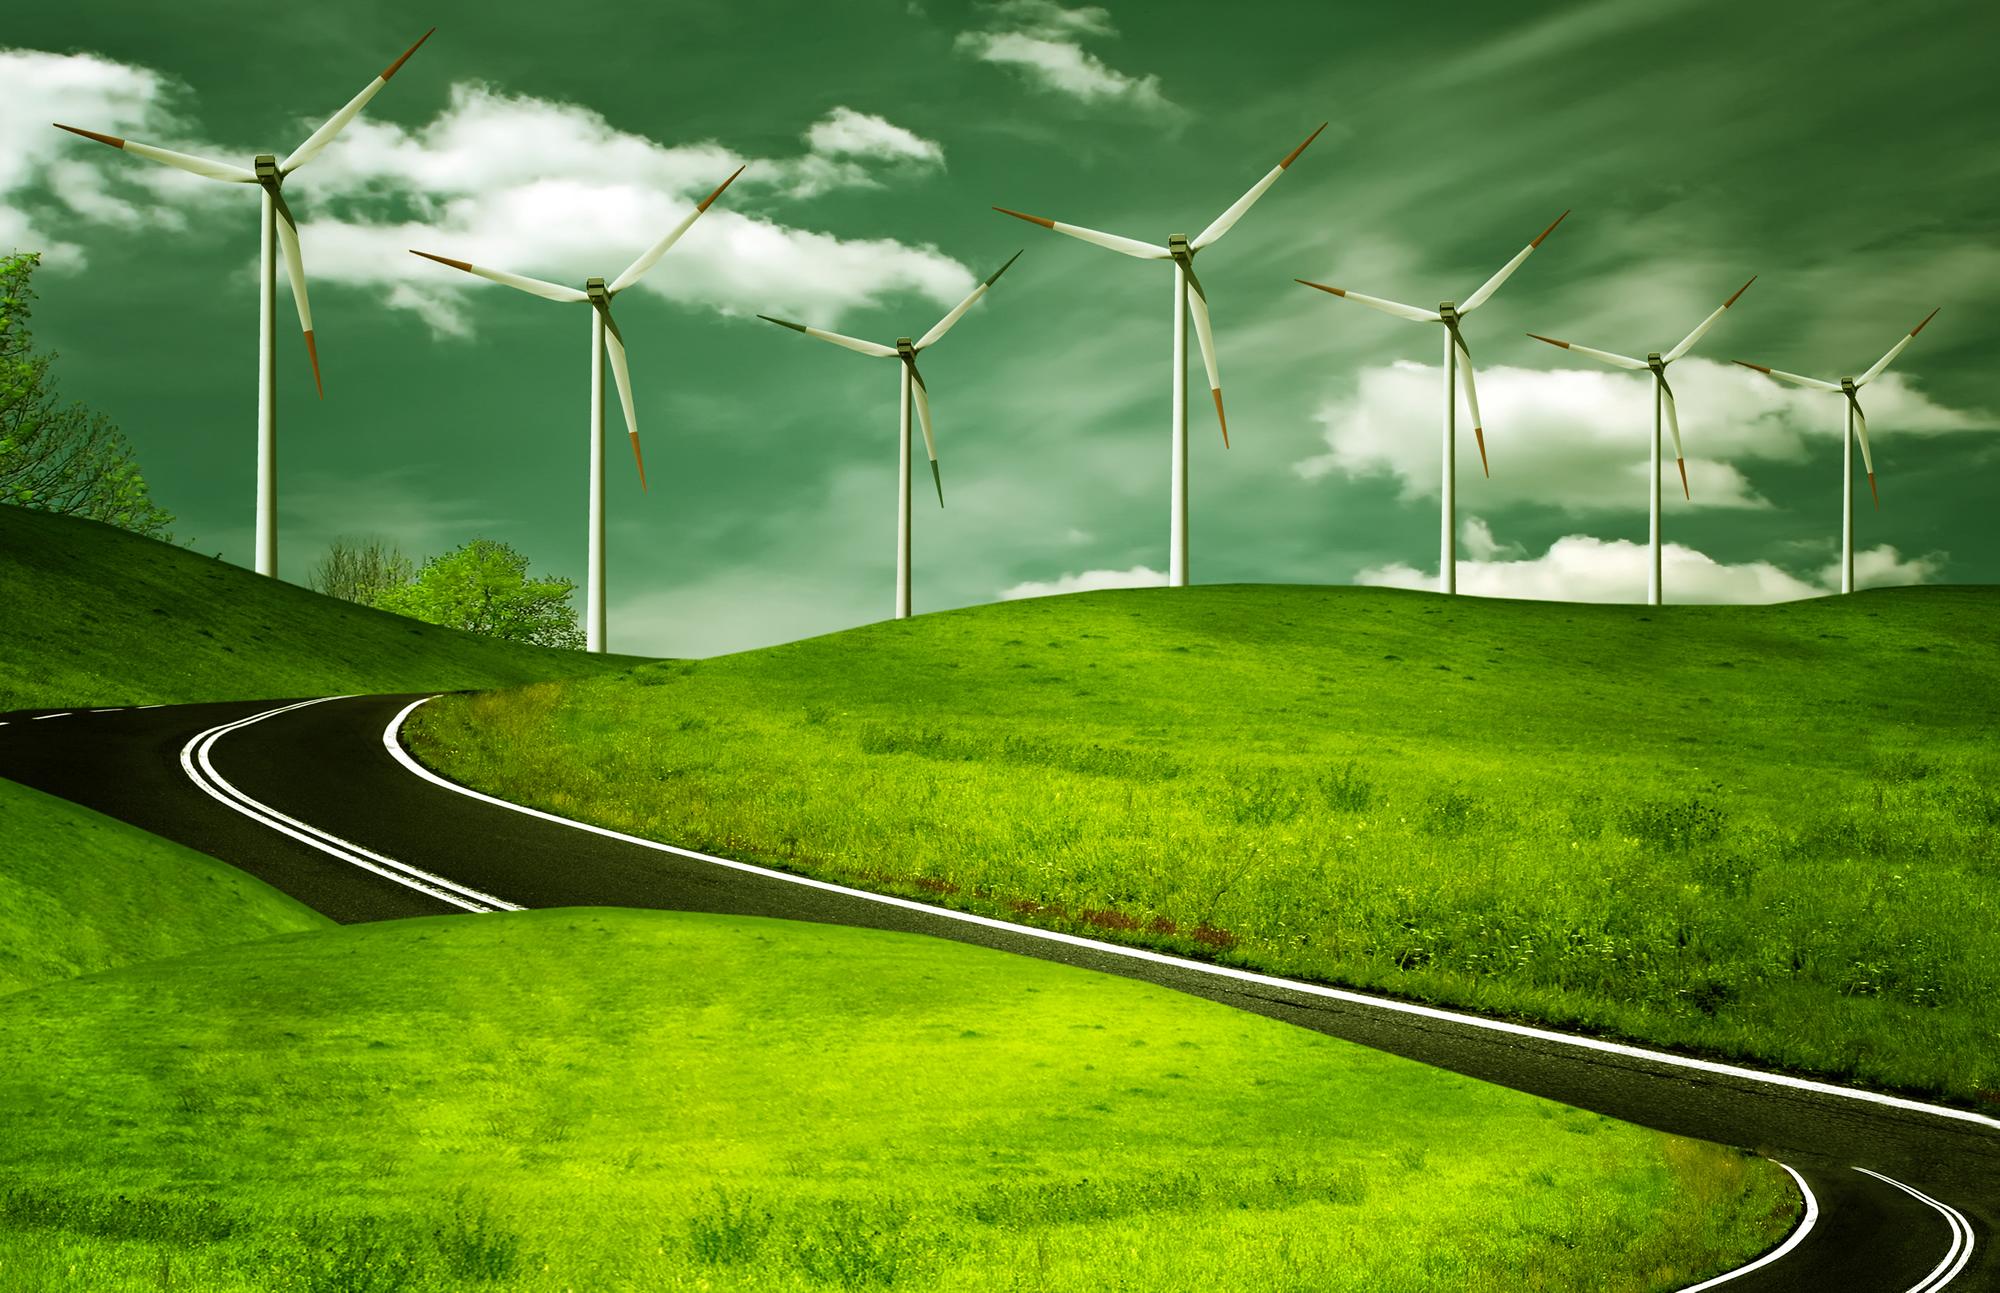 Дорога, зеленая трава, шоссе, фото, обои